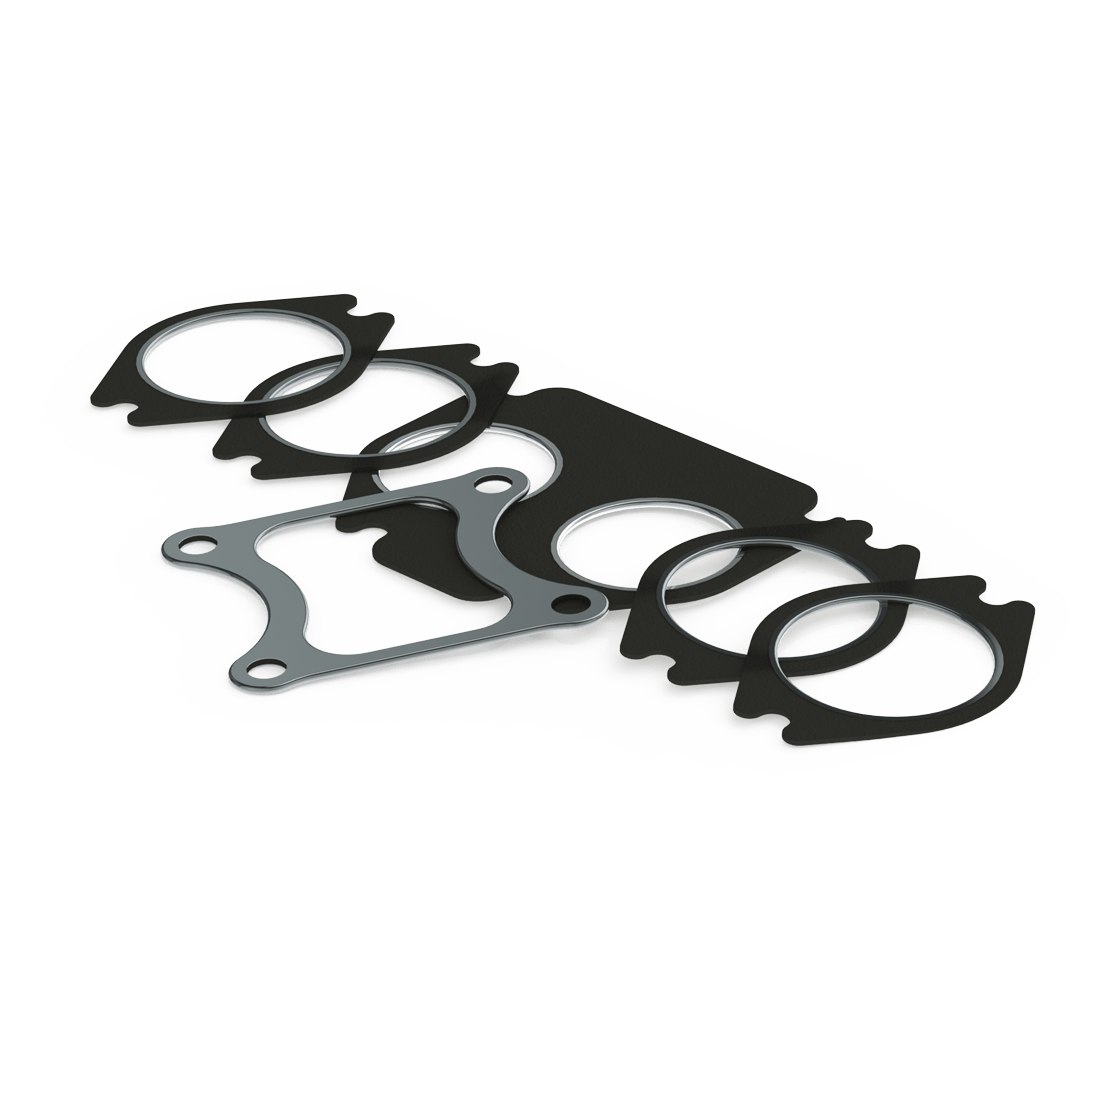 cummins 99 03 isx signature 600 exhaust manifold turbo gasket kit